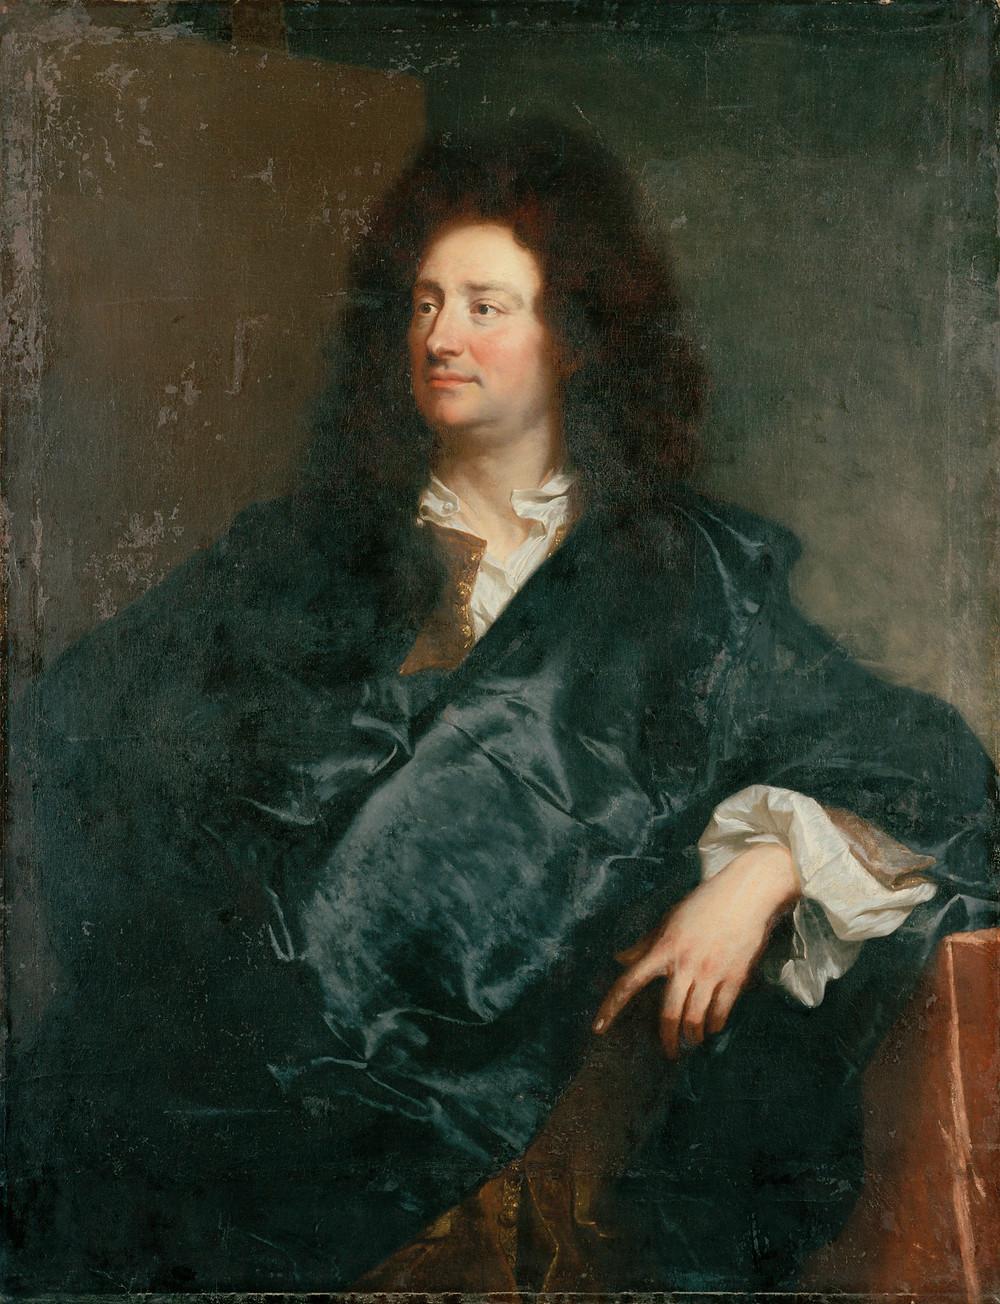 Hyacinthe Rigaud, Charles de La Fosse, 1691, Berlin, Schloss Charlottenburg